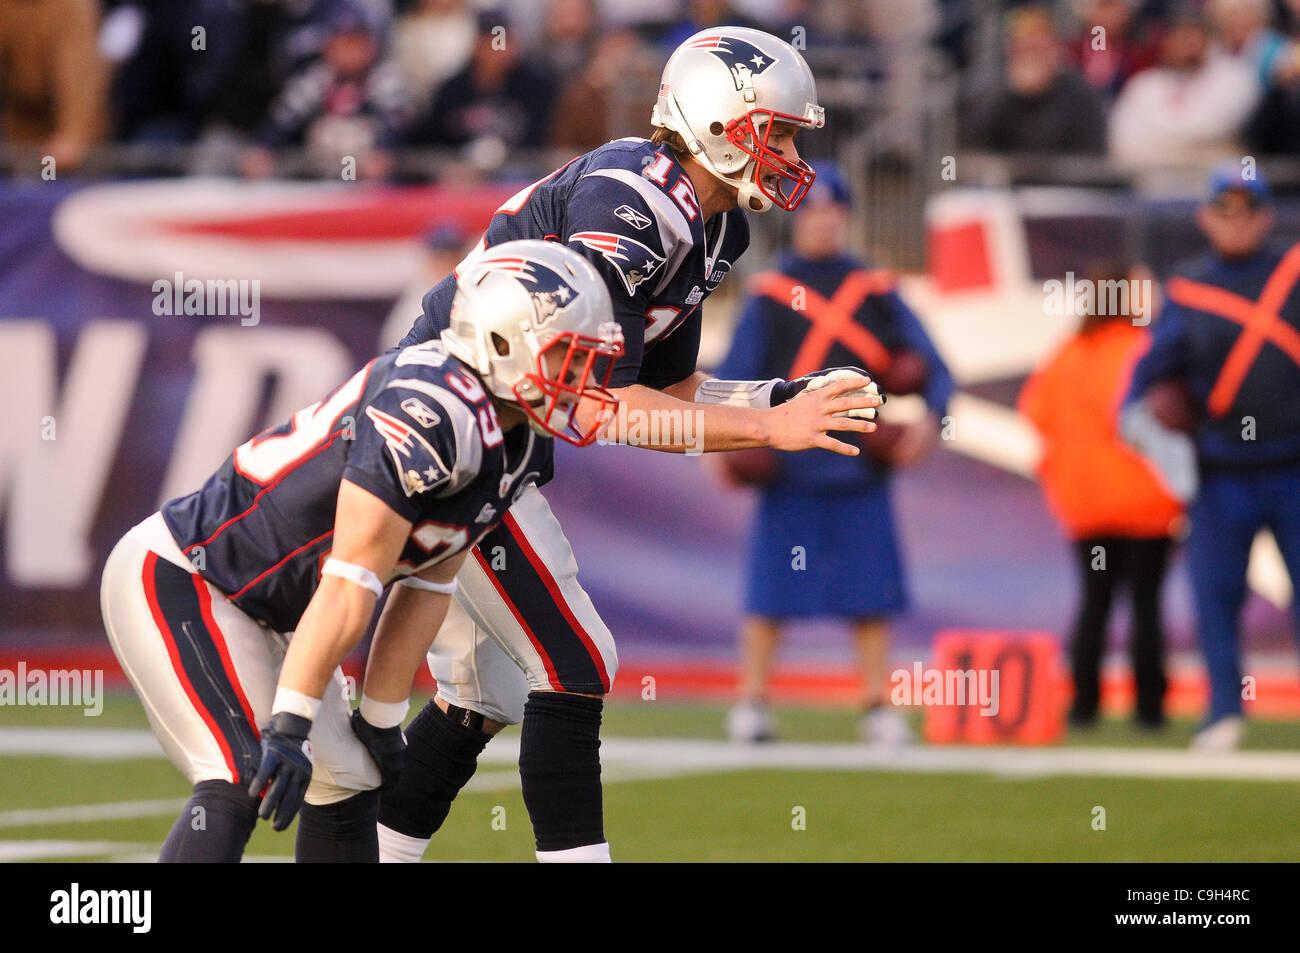 Jan. 1, 2012 - Foxborough, Massachusetts, U.S - New England Patriots QB Tom Brady (12) and RB Danny Woodhead (39) - Stock Image